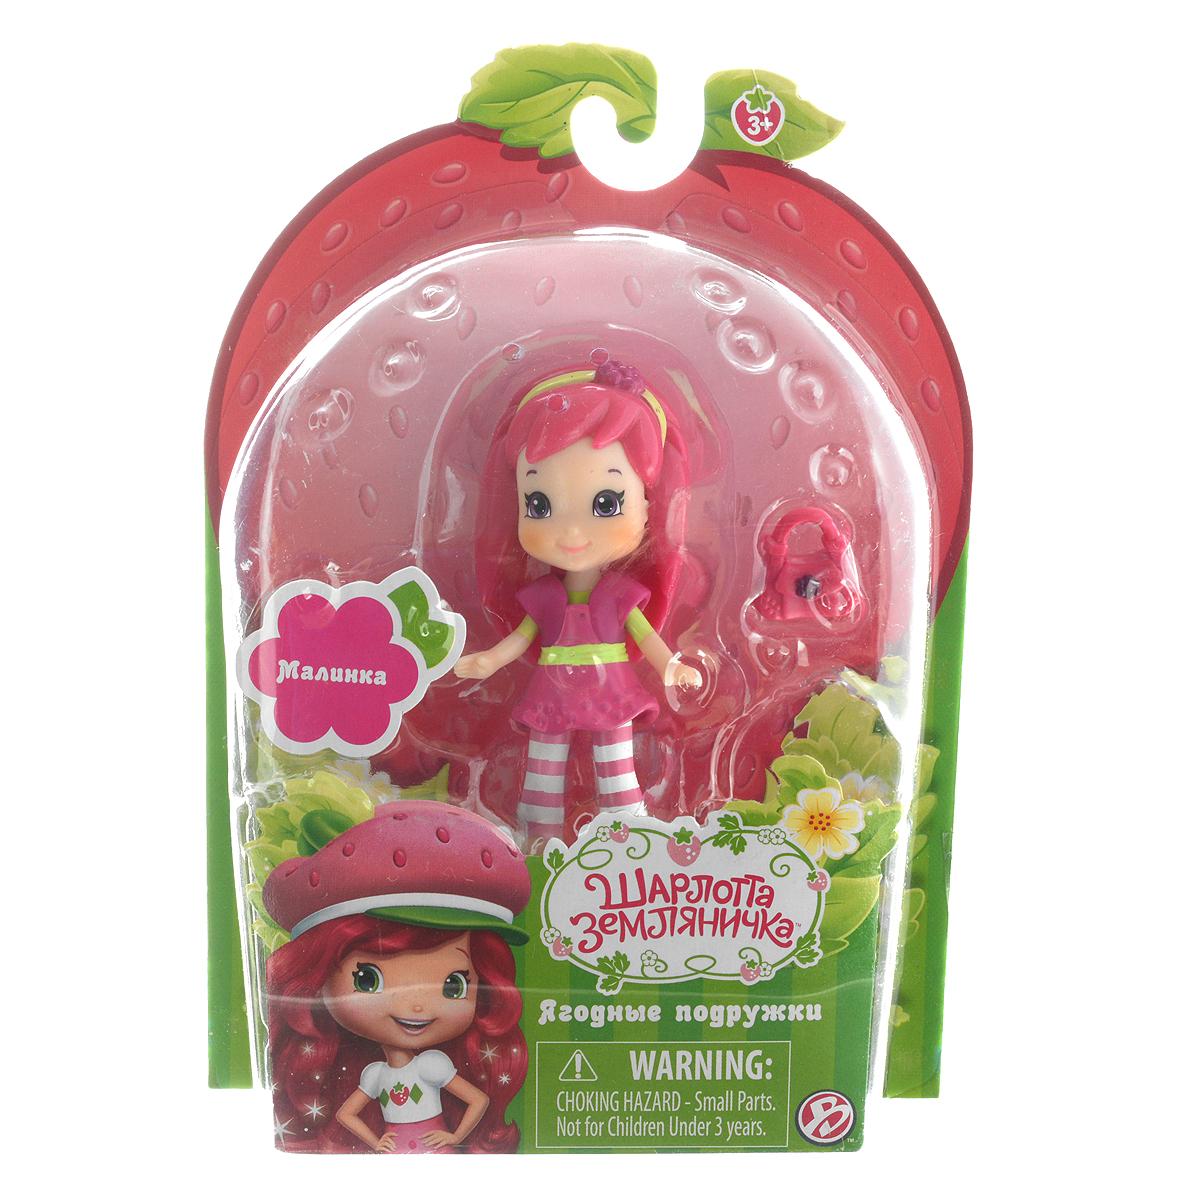 Шарлотта Земляничка Кукла Малинка, с аксессуаром, 8 см шарлотта земляничка мини кукла земляничка с сумкой